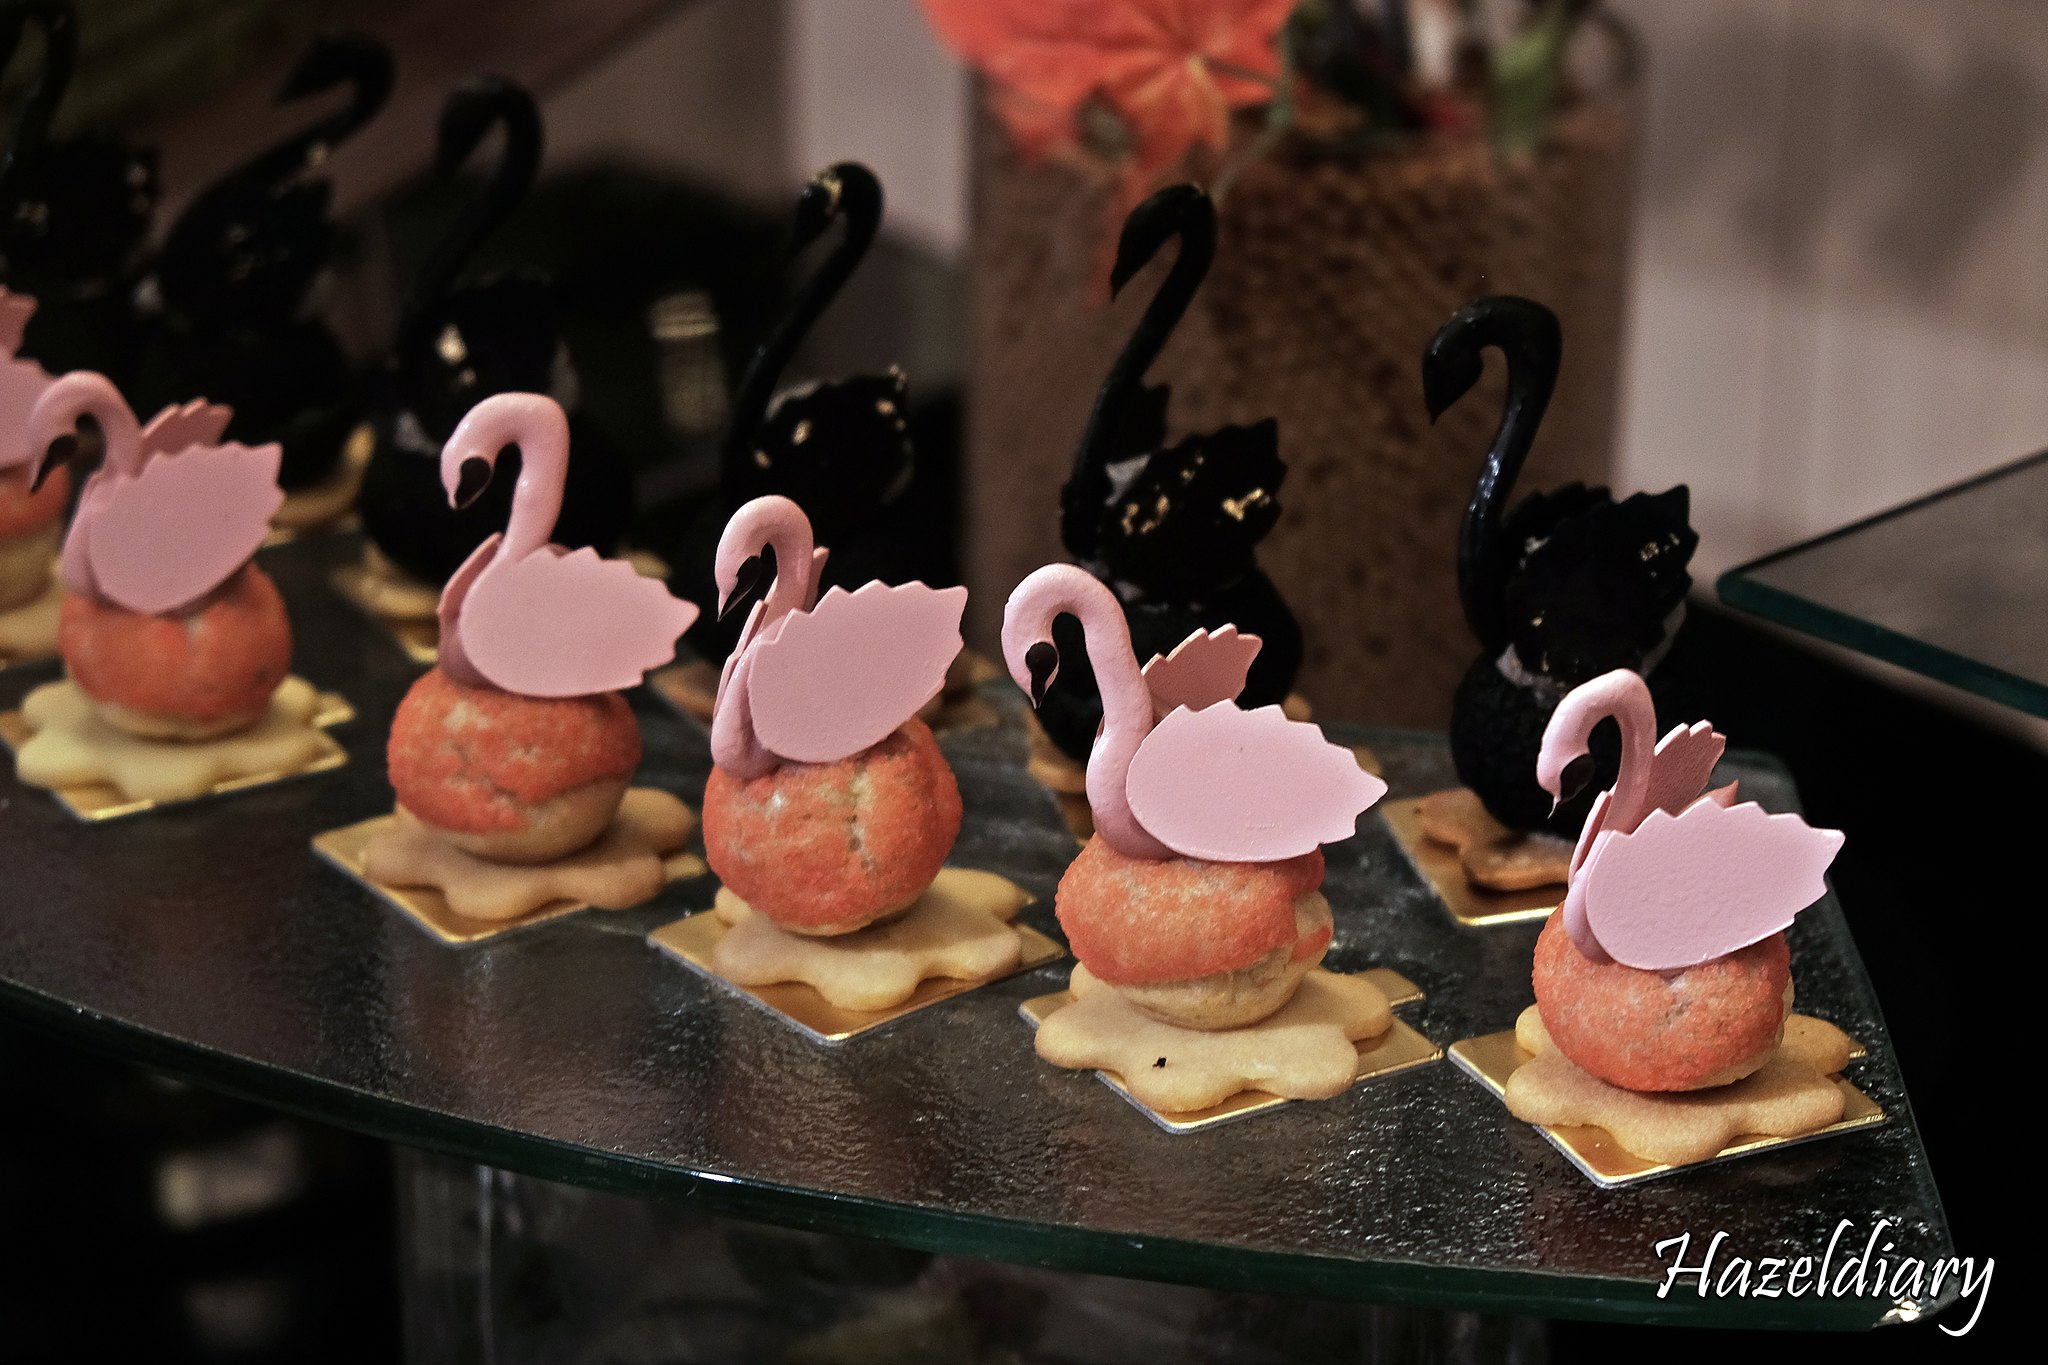 Hokkaido Harvests-Desserts-Mandarin Orchard